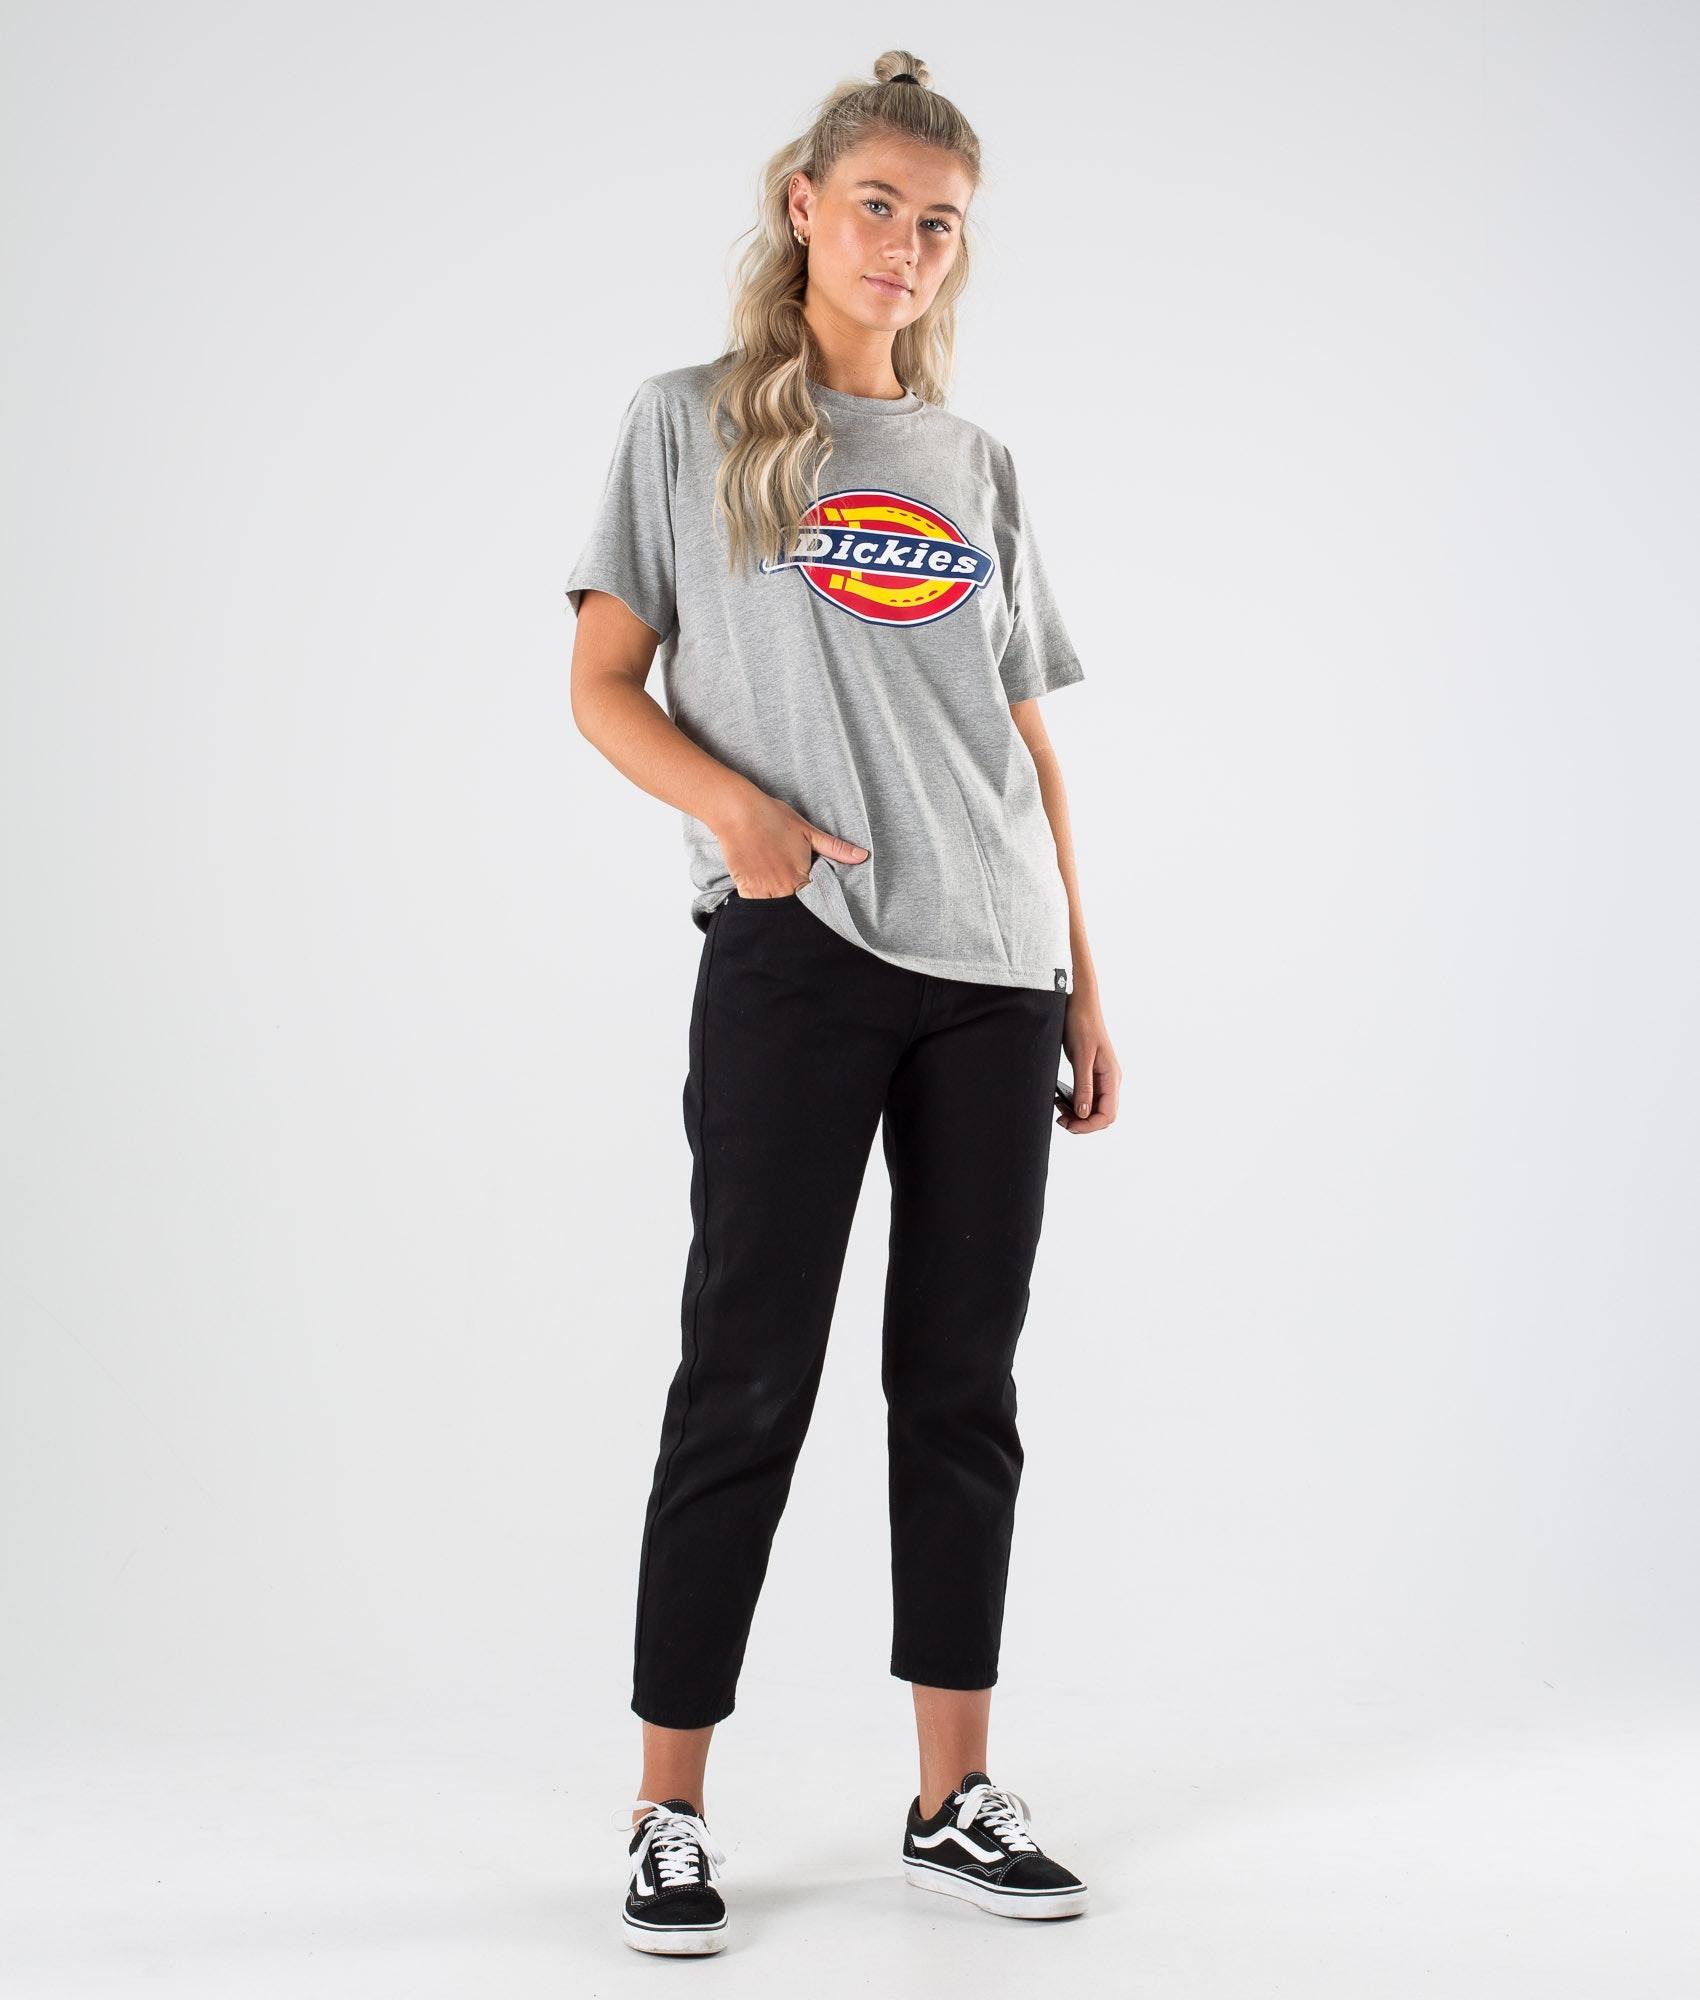 Shirt Tee Color Grey Melanche Grey Dickies Workwear Horseshoe T